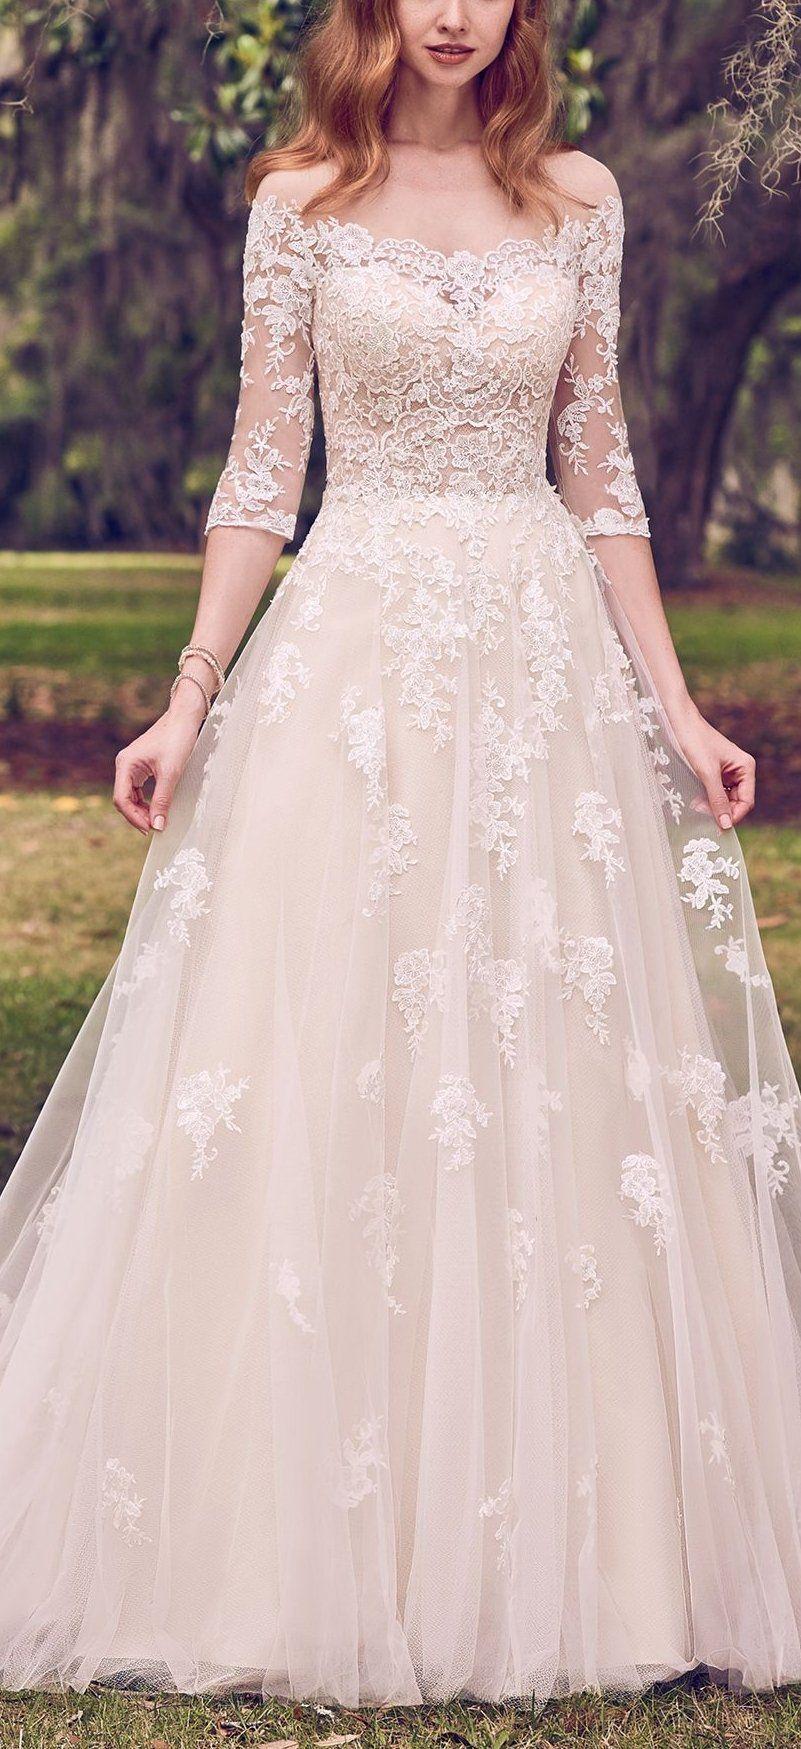 Bree By Maggie Sottero Wedding Dresses Dresses Best Wedding